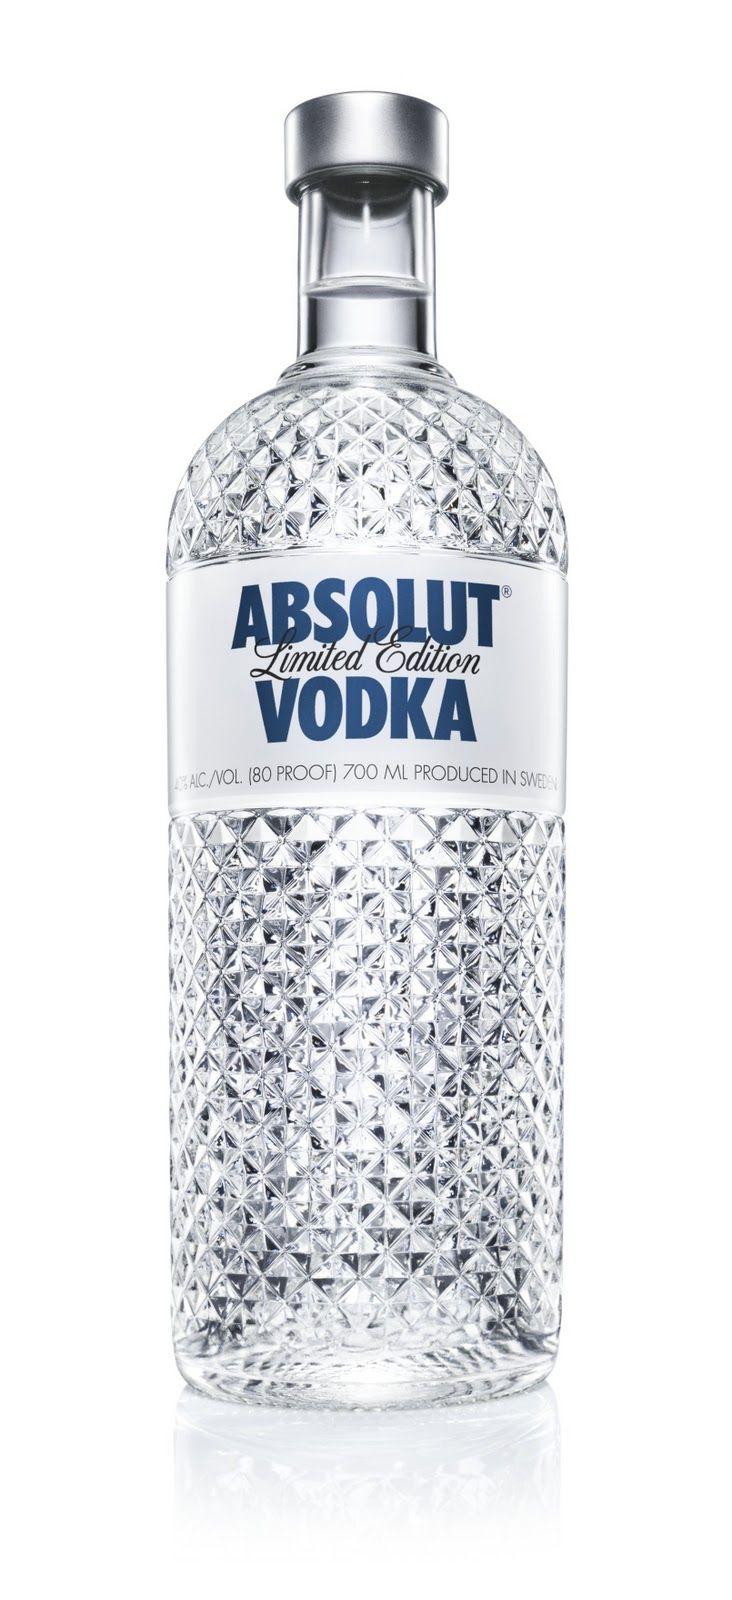 Goede Absolut Vodka - Limited Edition: Absolut Glimmer (2011) | Absolut BK-92